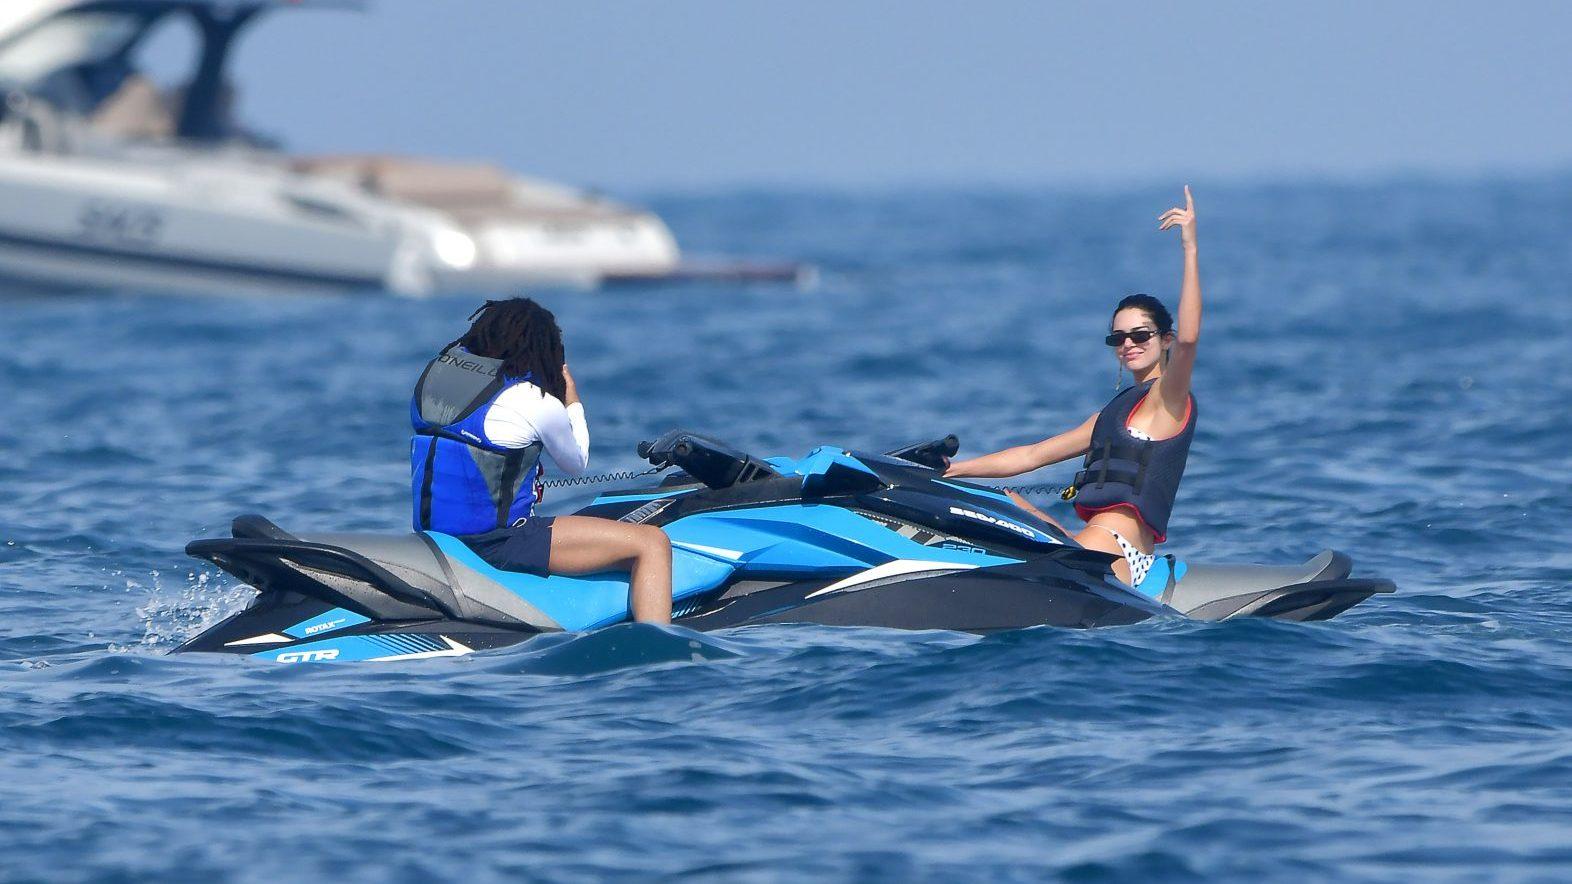 Kendall Jenner Rides Jetskis With Luka Sabbat in Monaco Post-Ben Simmons Split